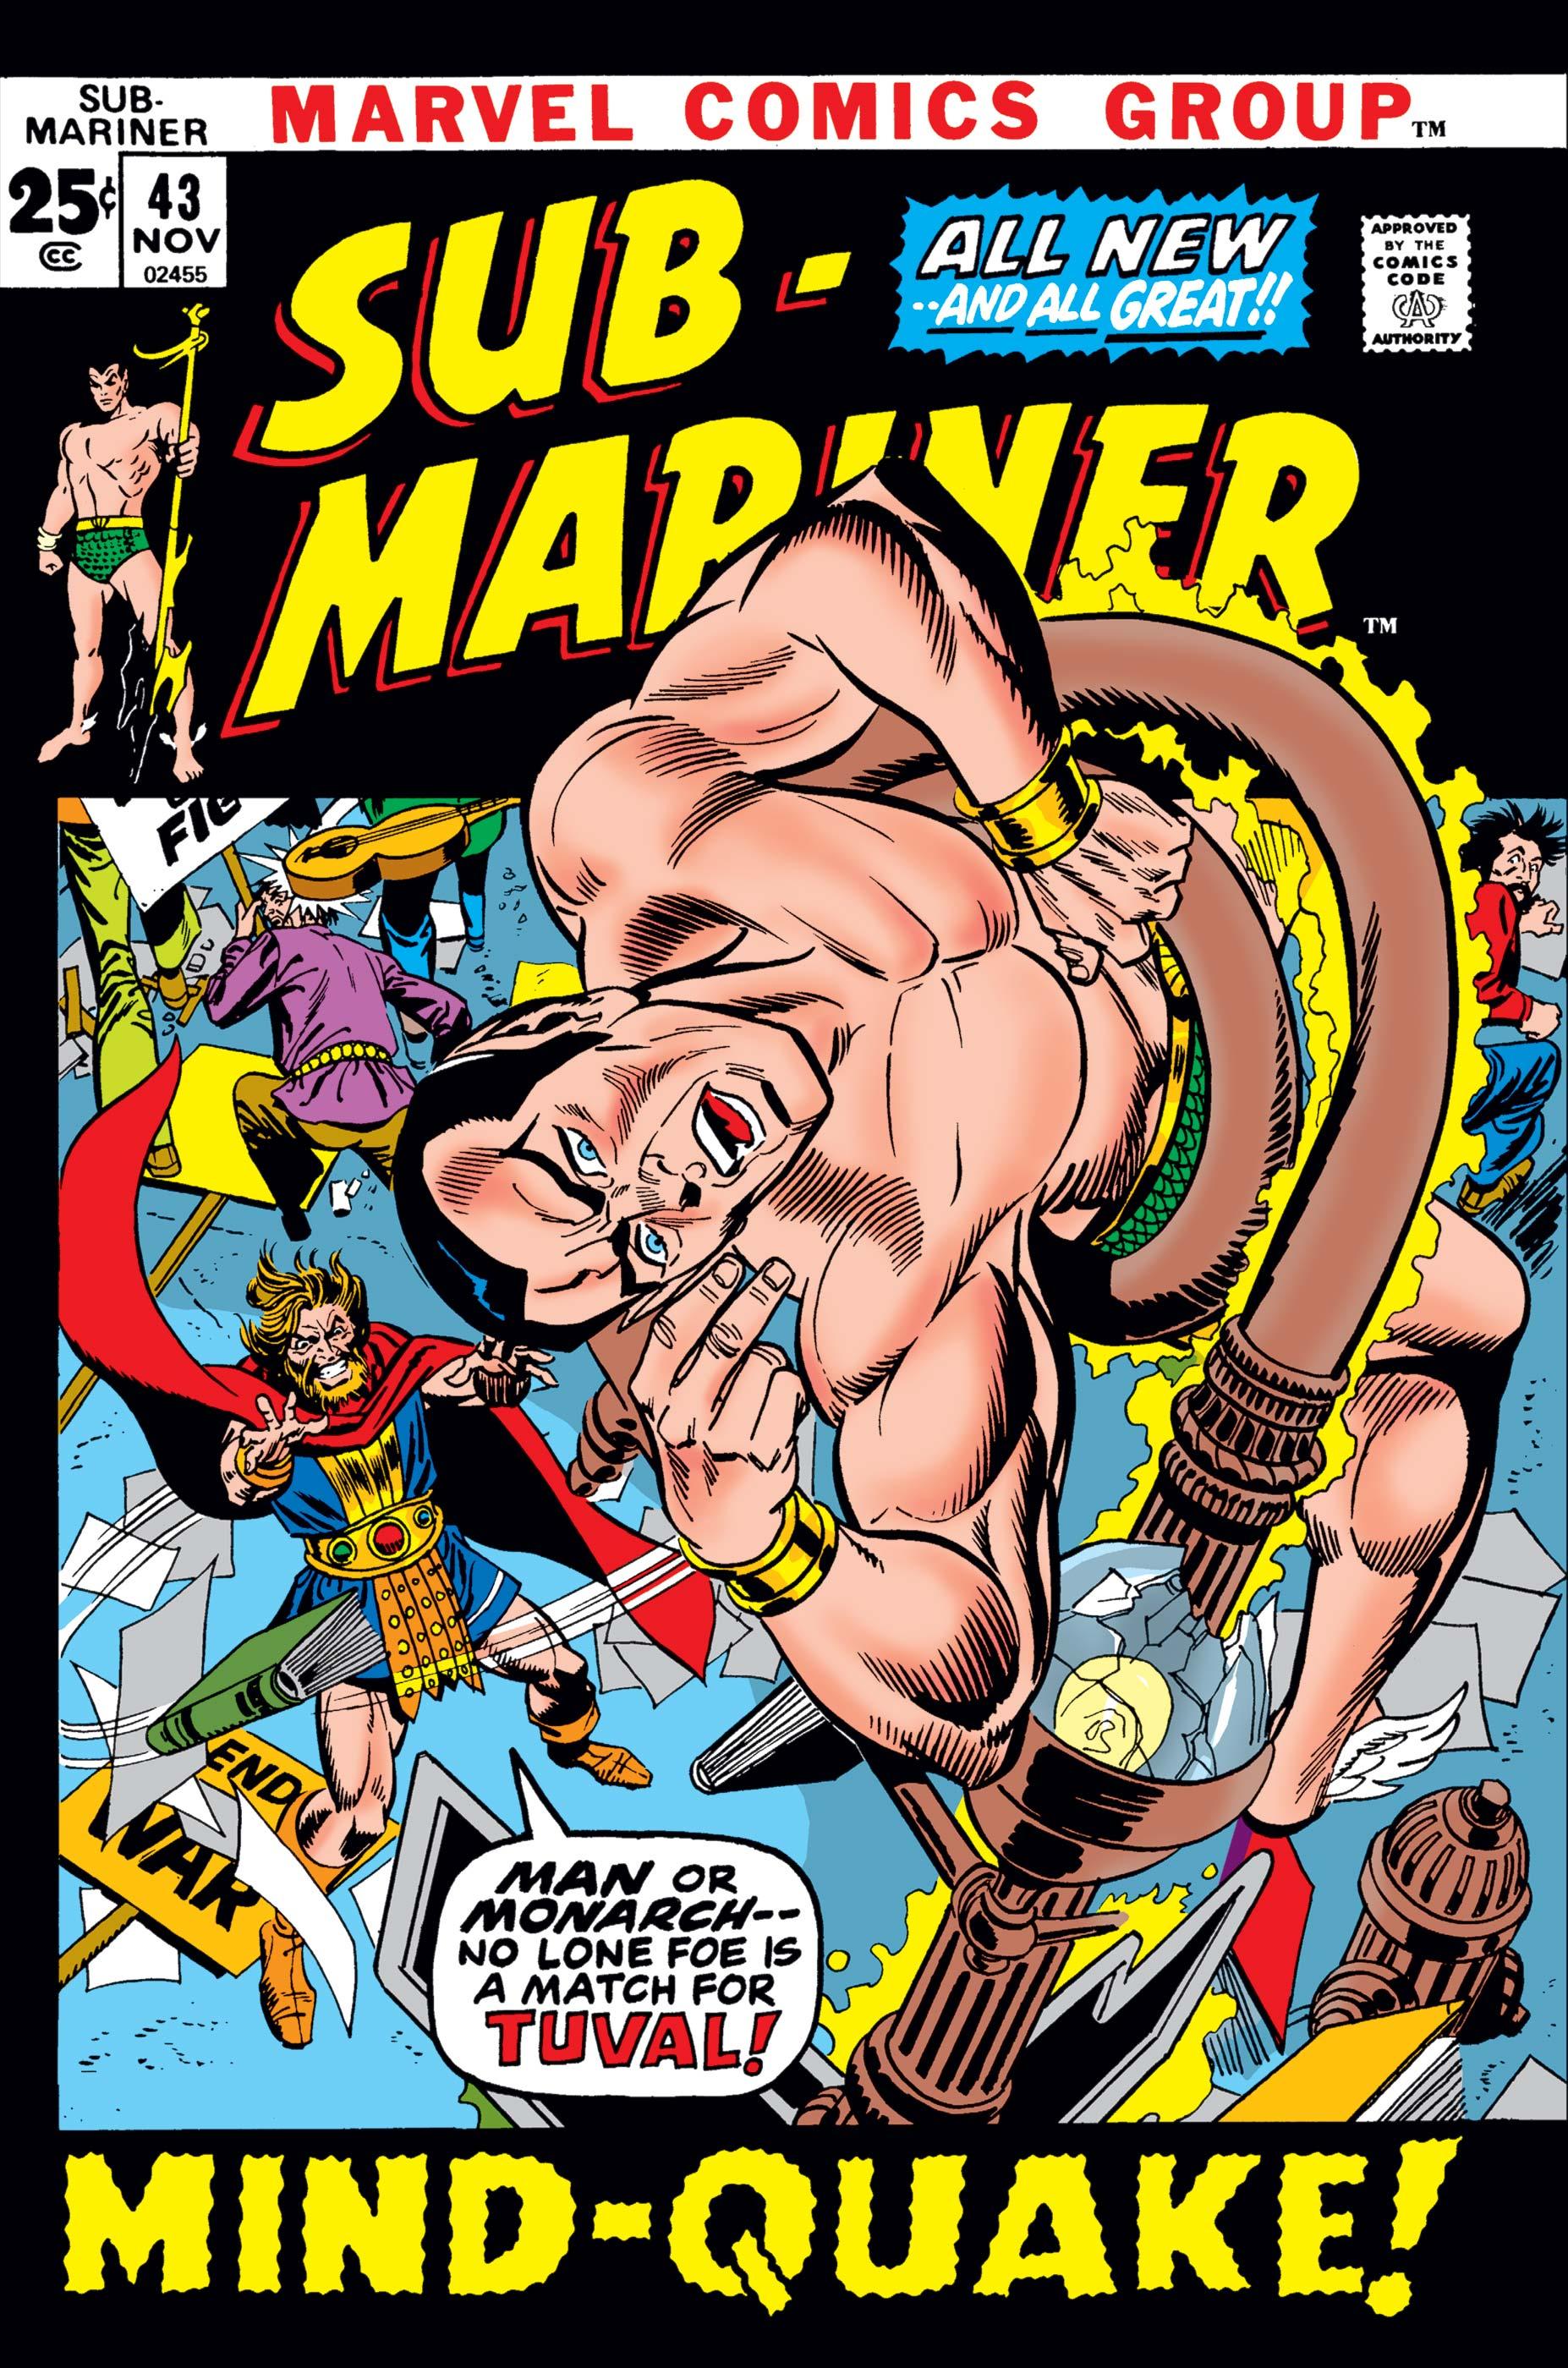 Sub-Mariner (1968) #43